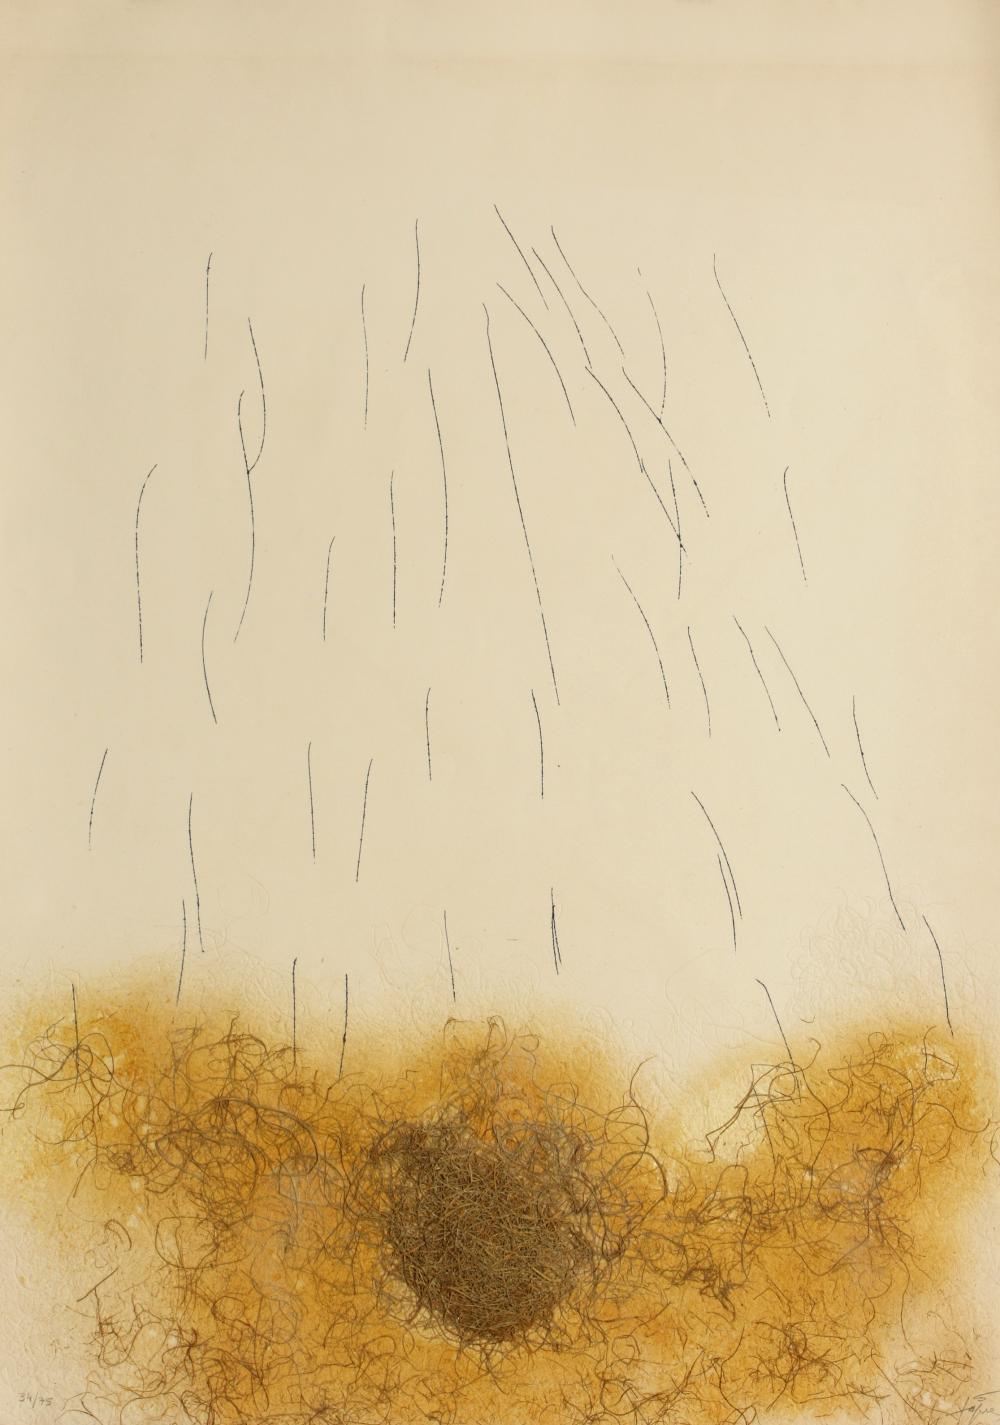 Antoni Tàpies (Spain 1923-2012) Le Crin (Horsehair), 1971